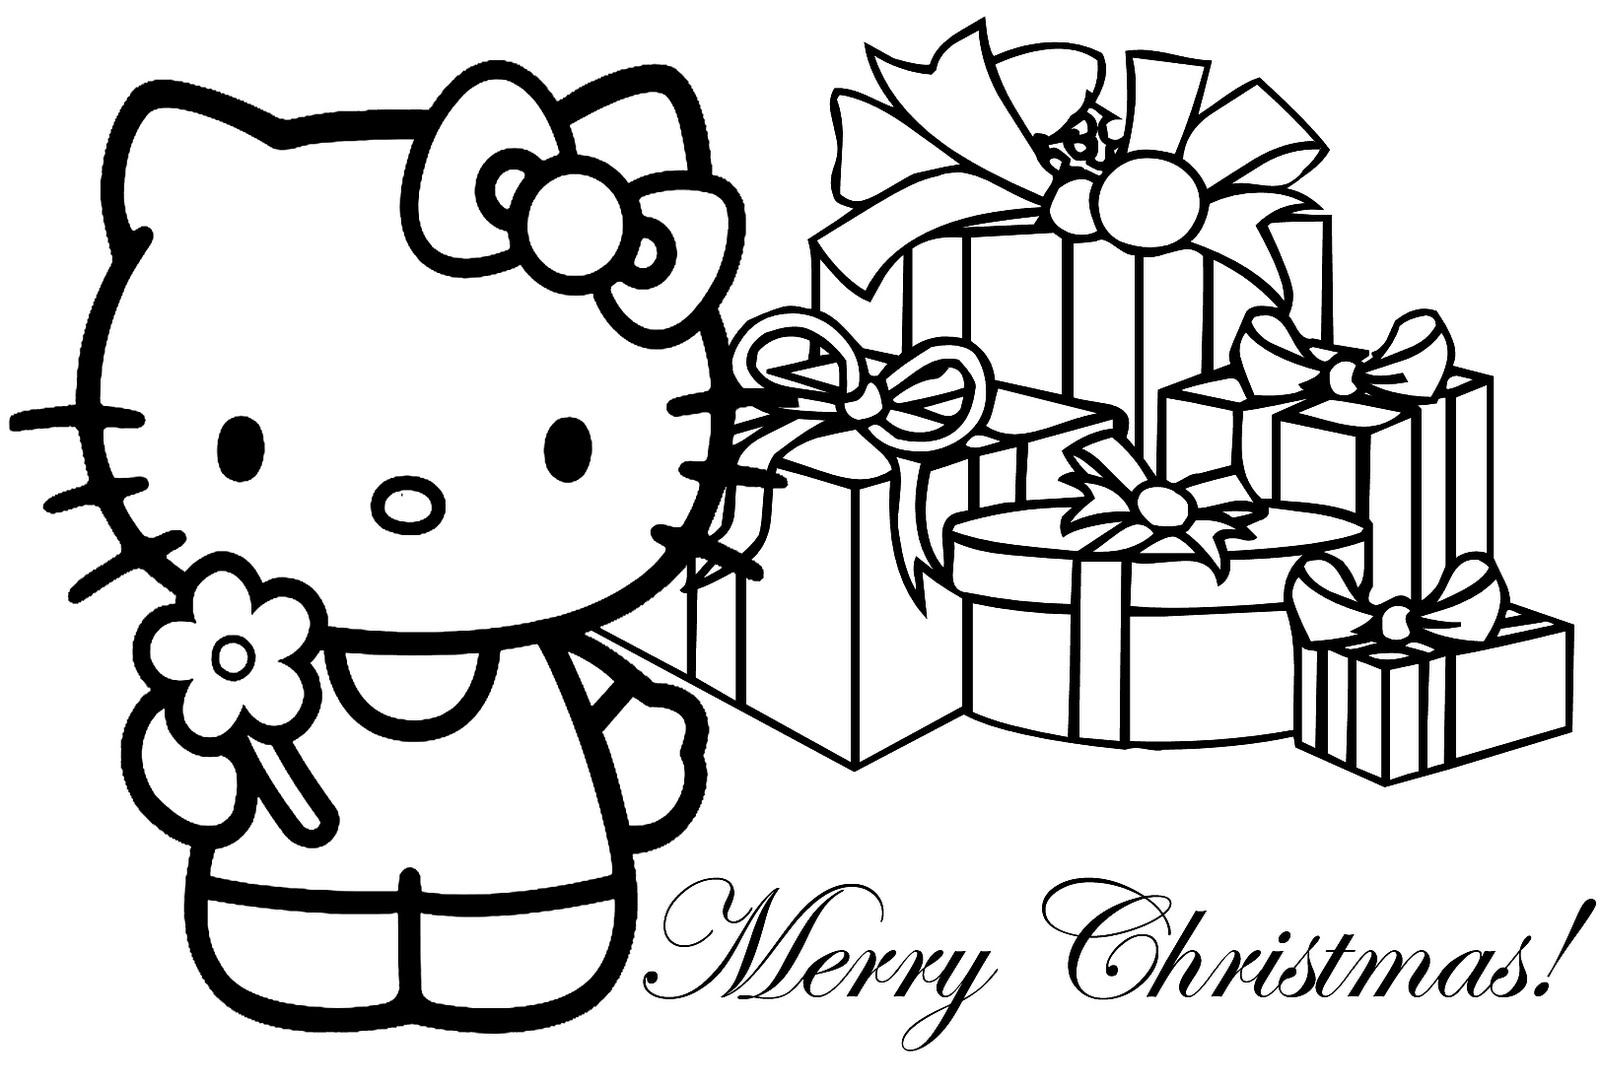 Christmas cartoon coloring pages printable ~ Hello Kitty Christmas Coloring Pages - Best Gift Ideas Blog